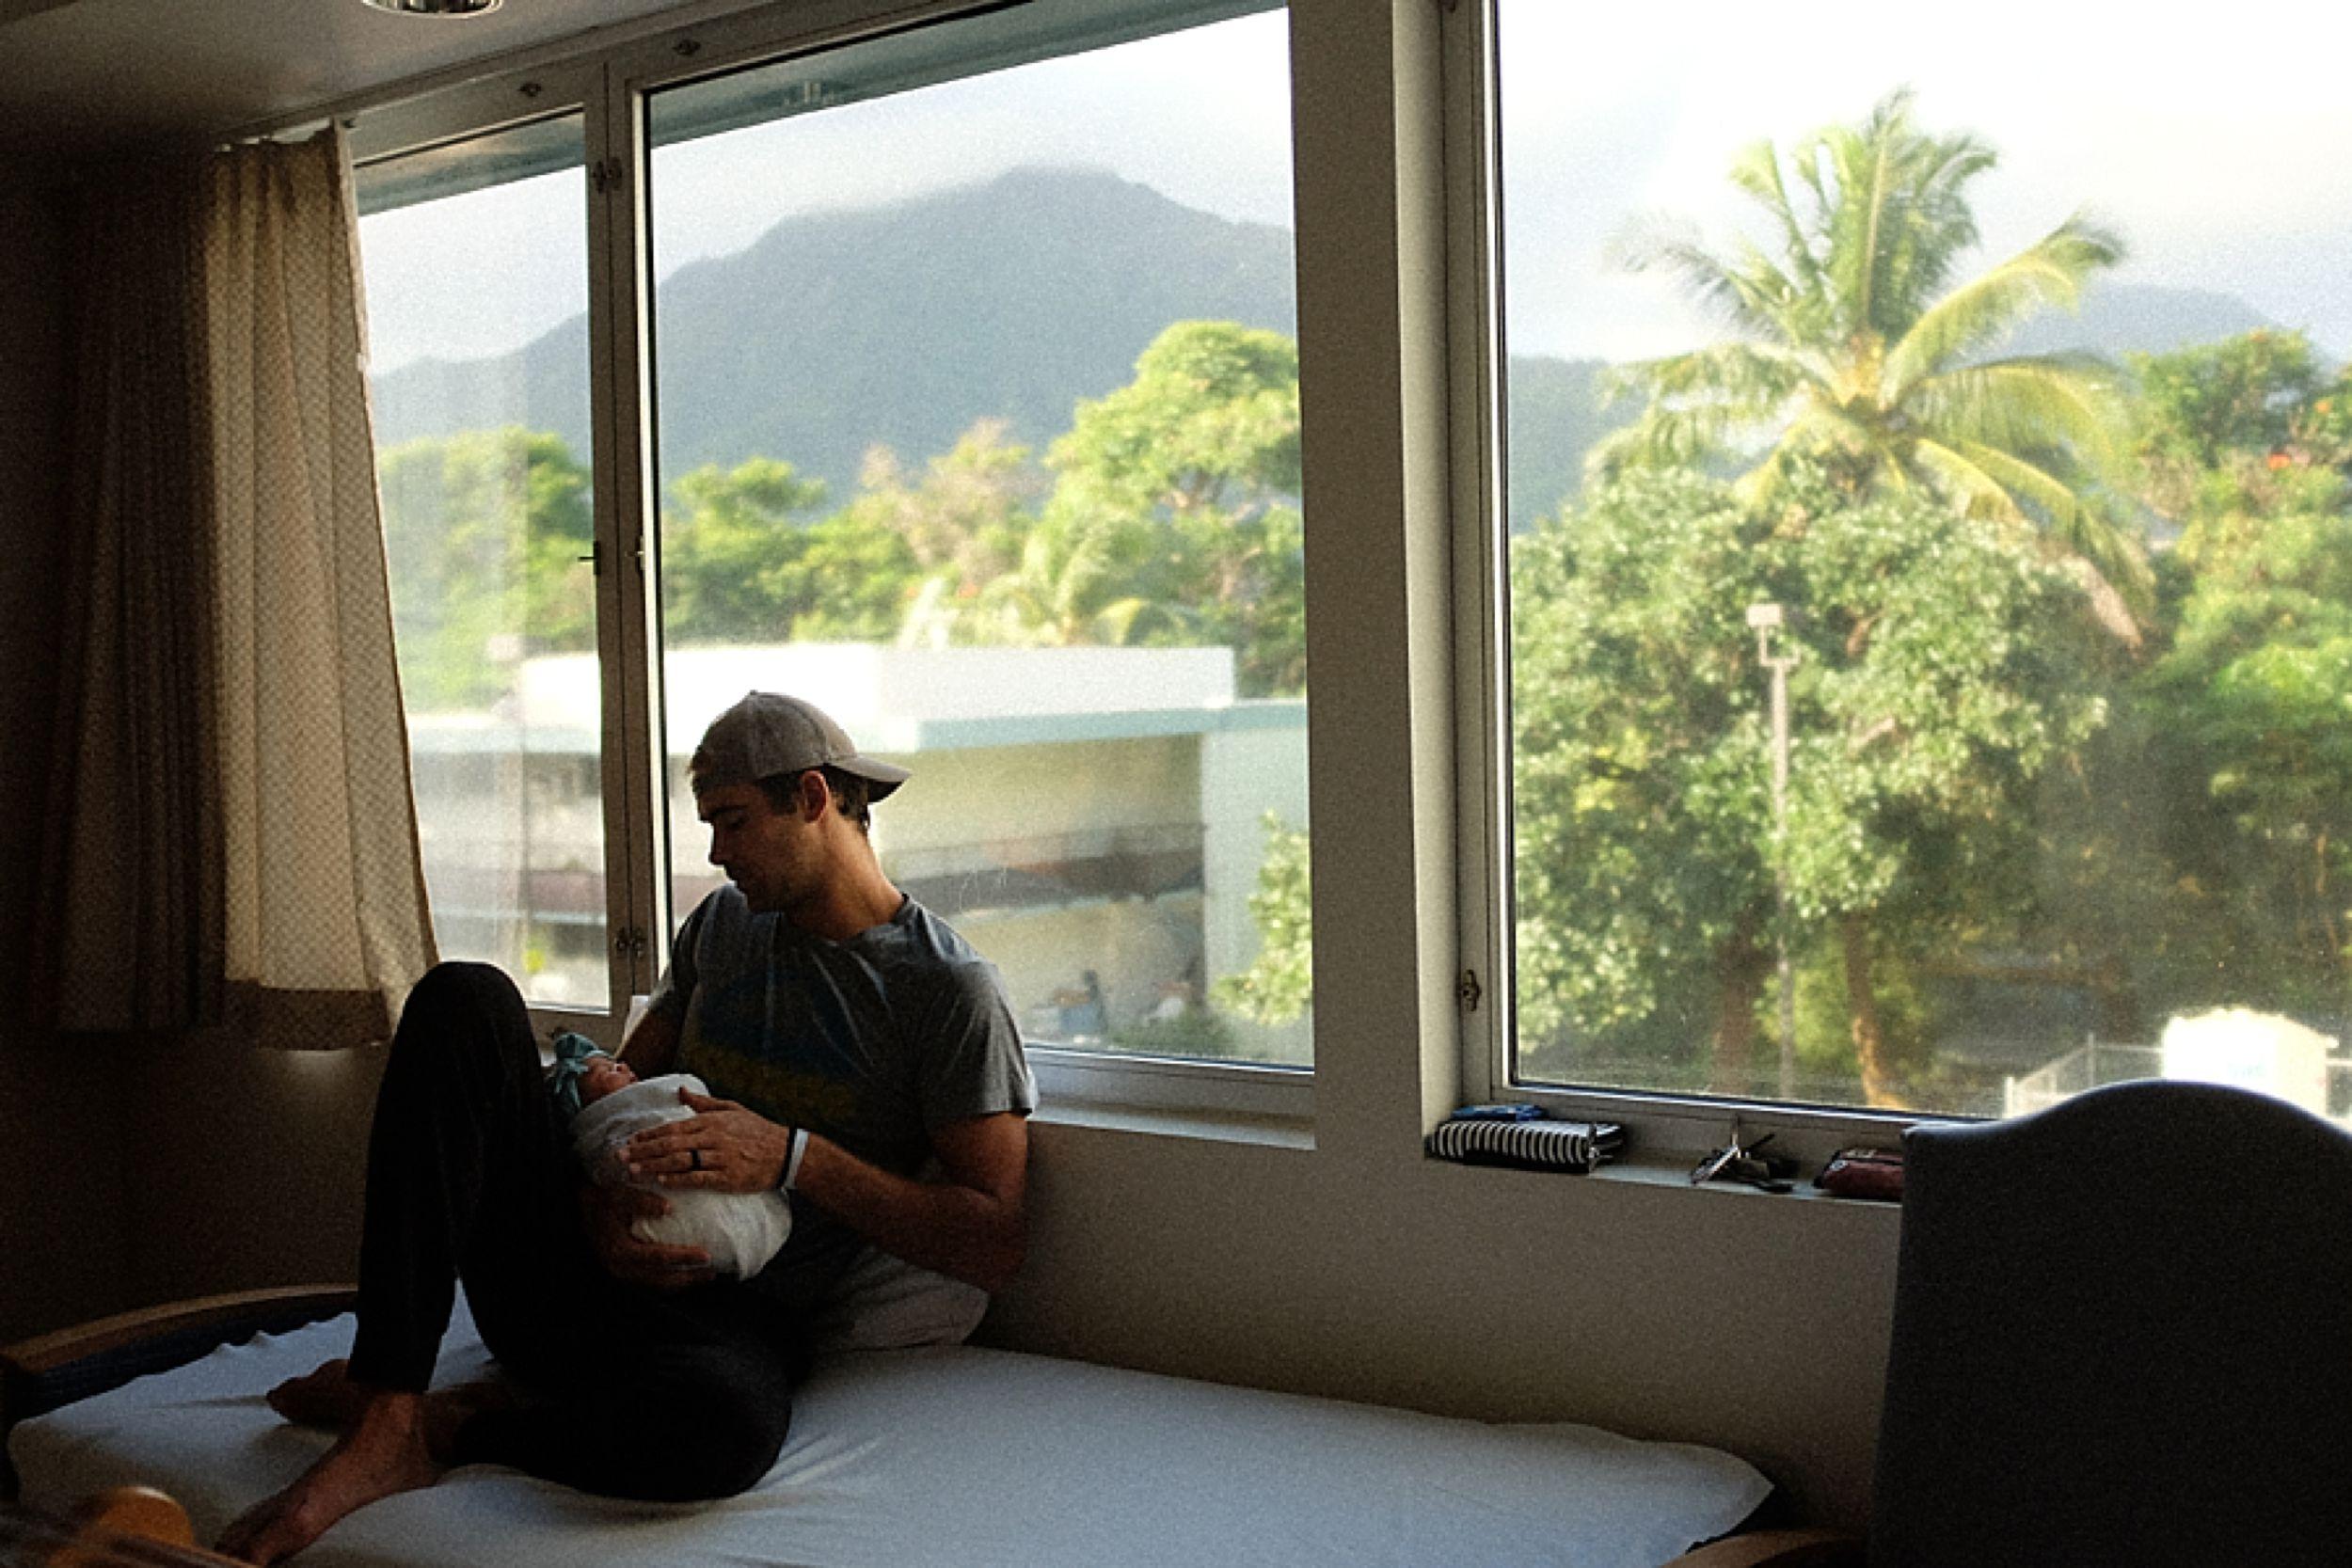 living-in-hawaii-north-shore_0056.jpg